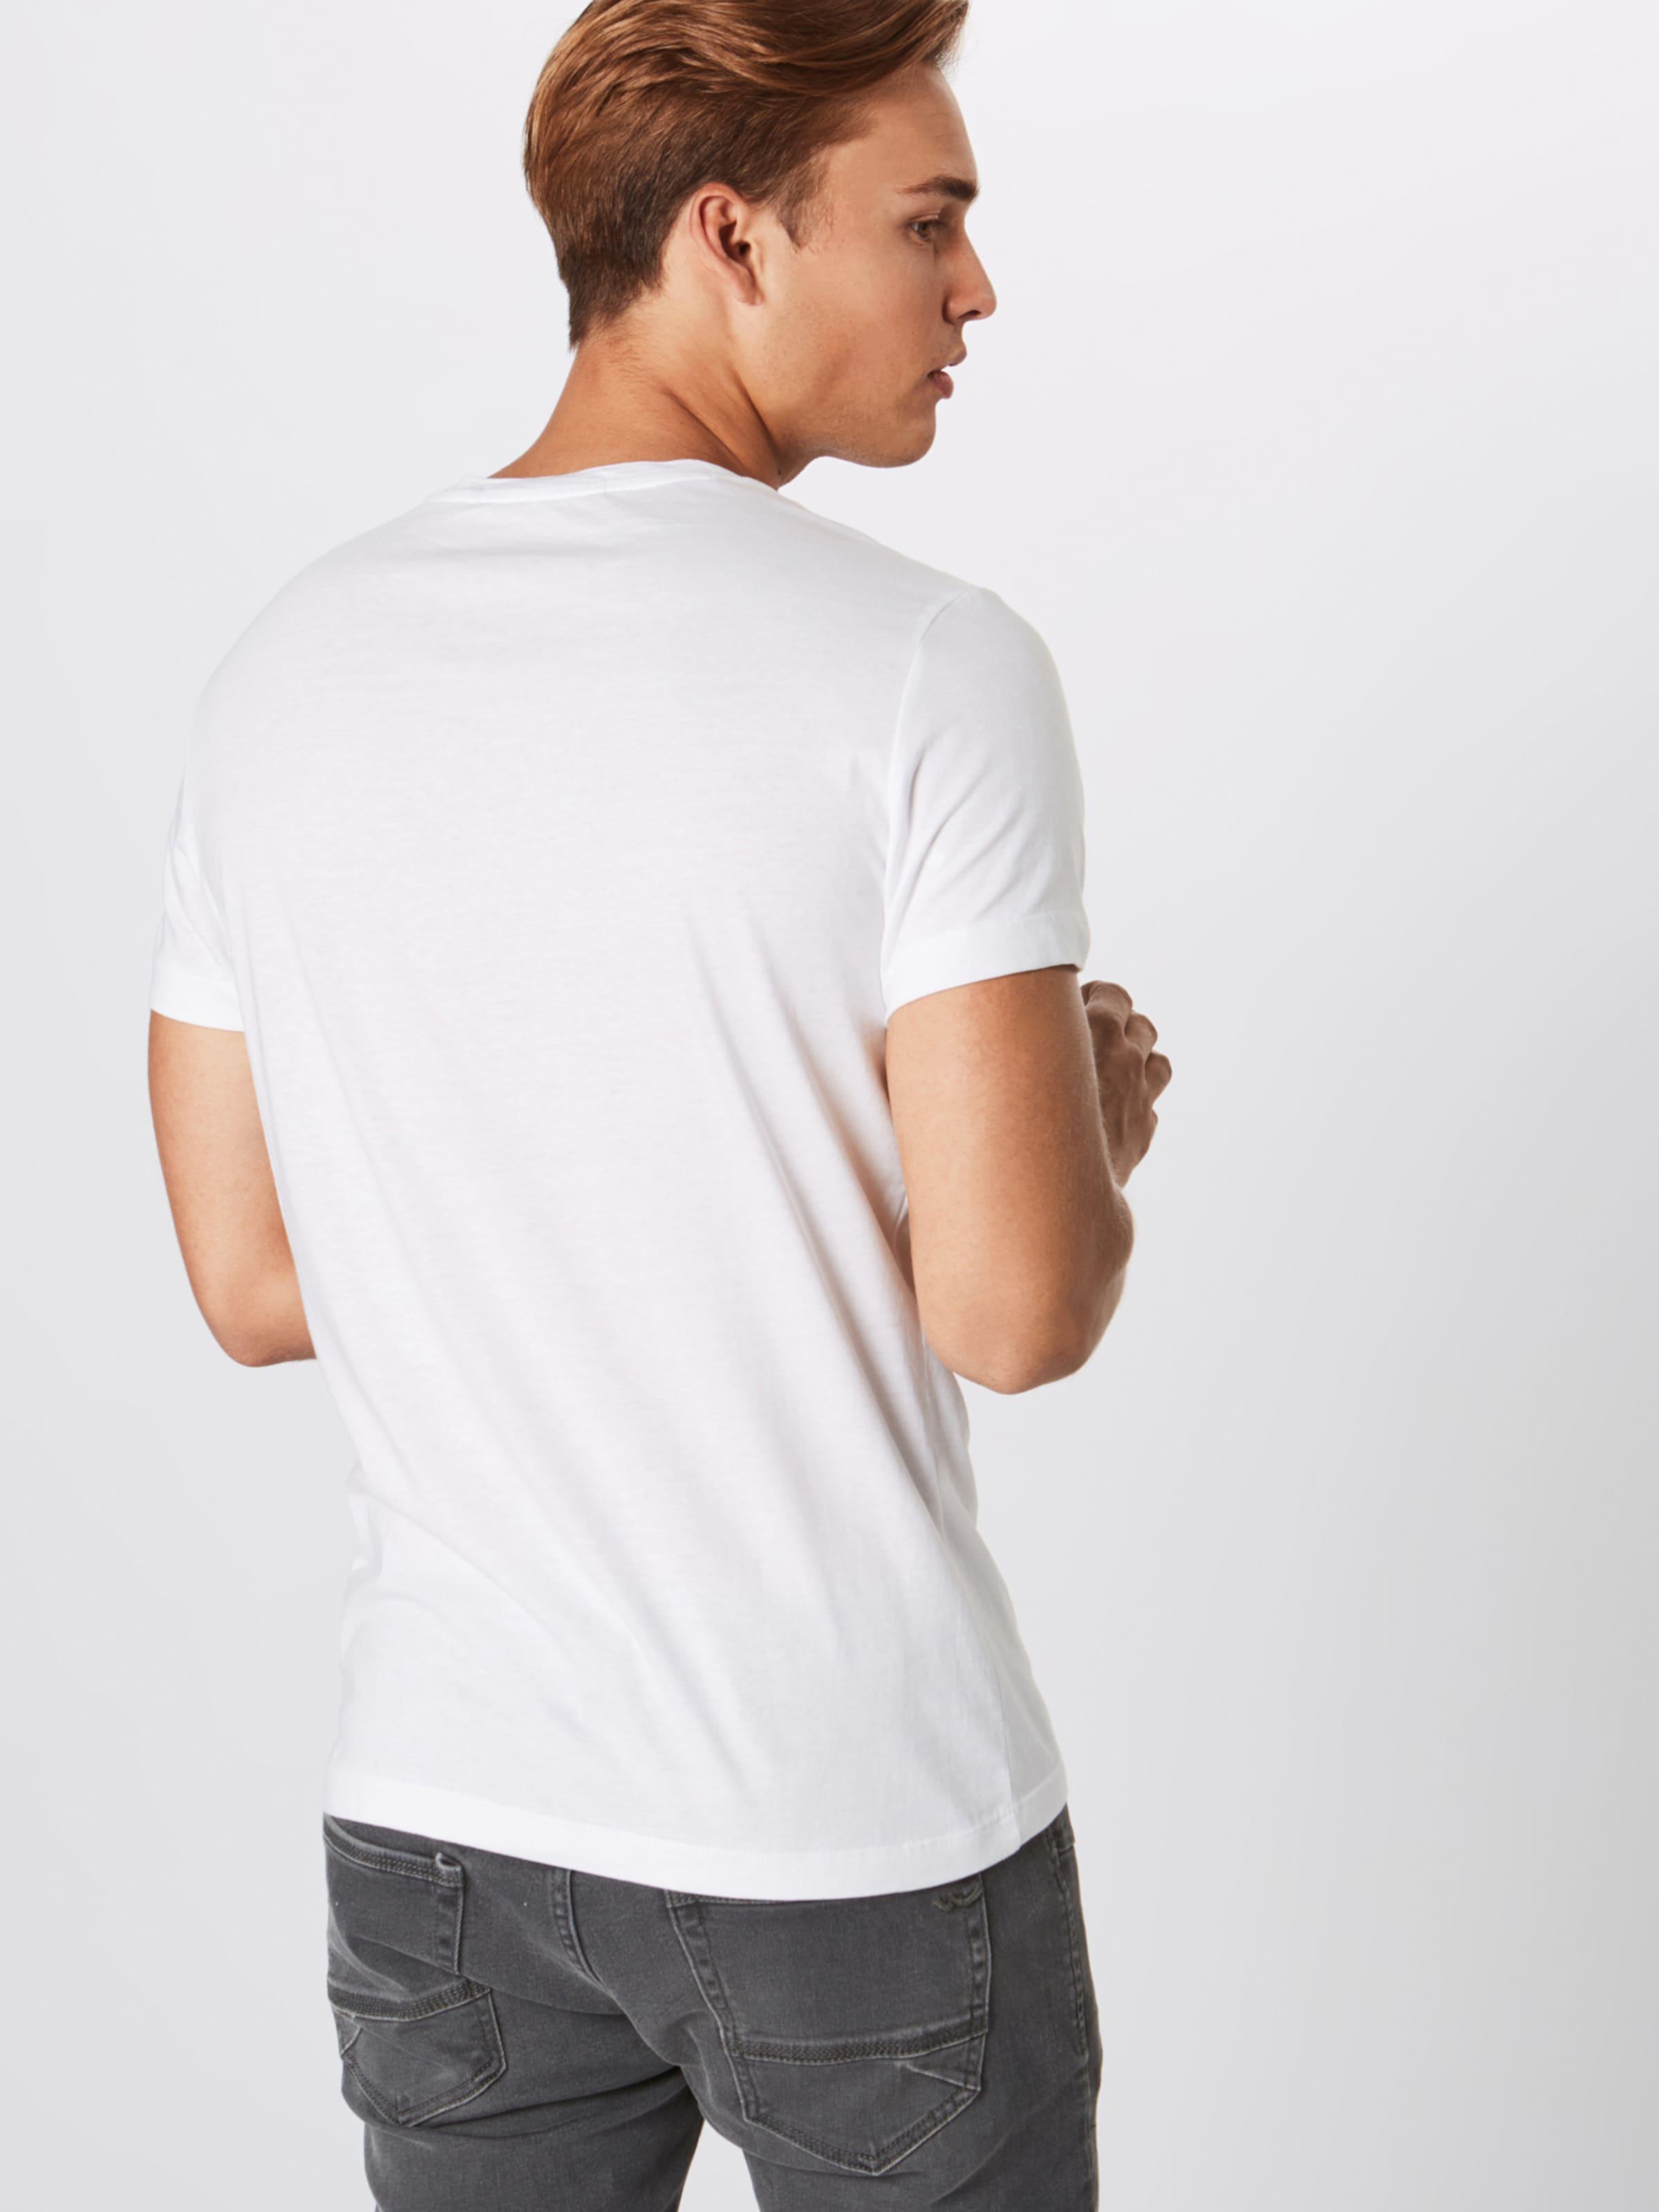 Klein 'core In Slim Wit Tee' Shirt Calvin Jeans Institutional Logo PNw8nO0kX